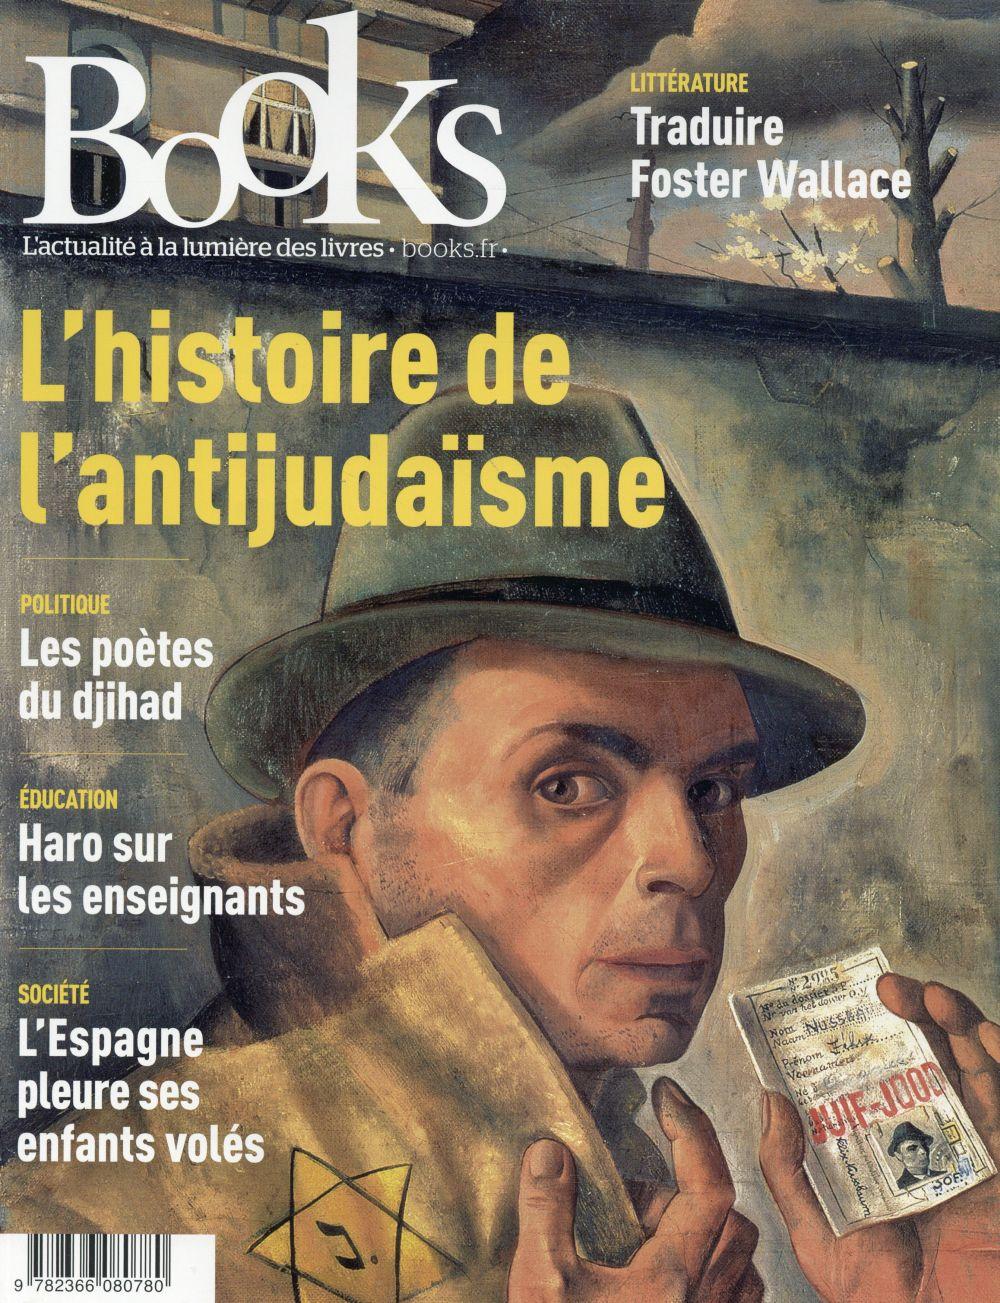 Books n.69 ; octobre 2015 ; l'histoire de l'antijudaisme